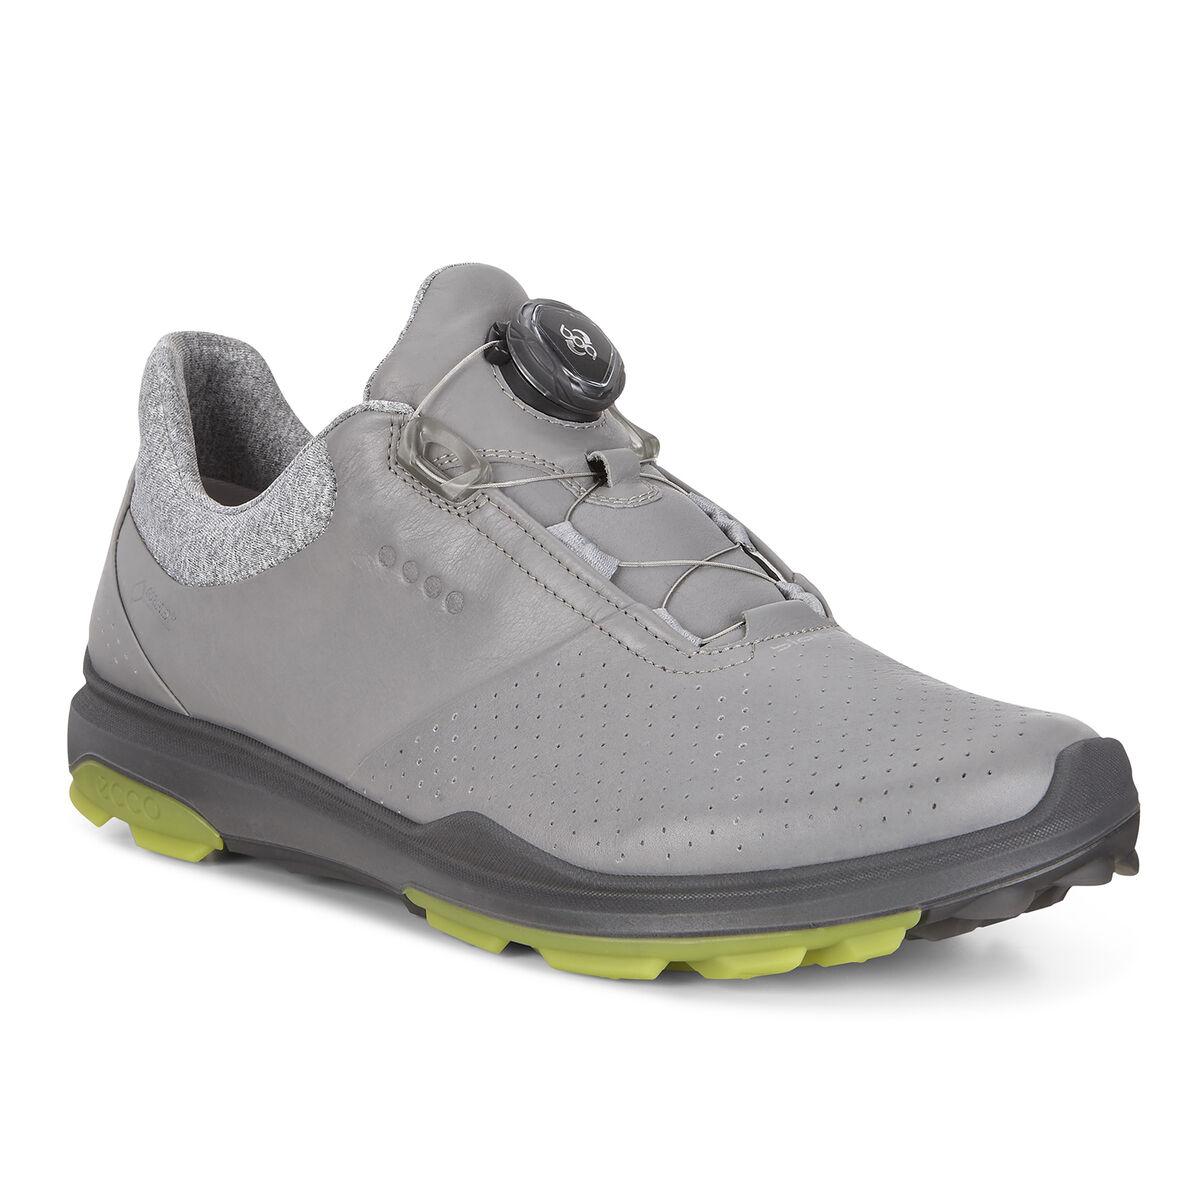 2ad5d0309f0a34 ECCO BIOM Hybrid 3 BOA Men s Golf Shoe - Grey